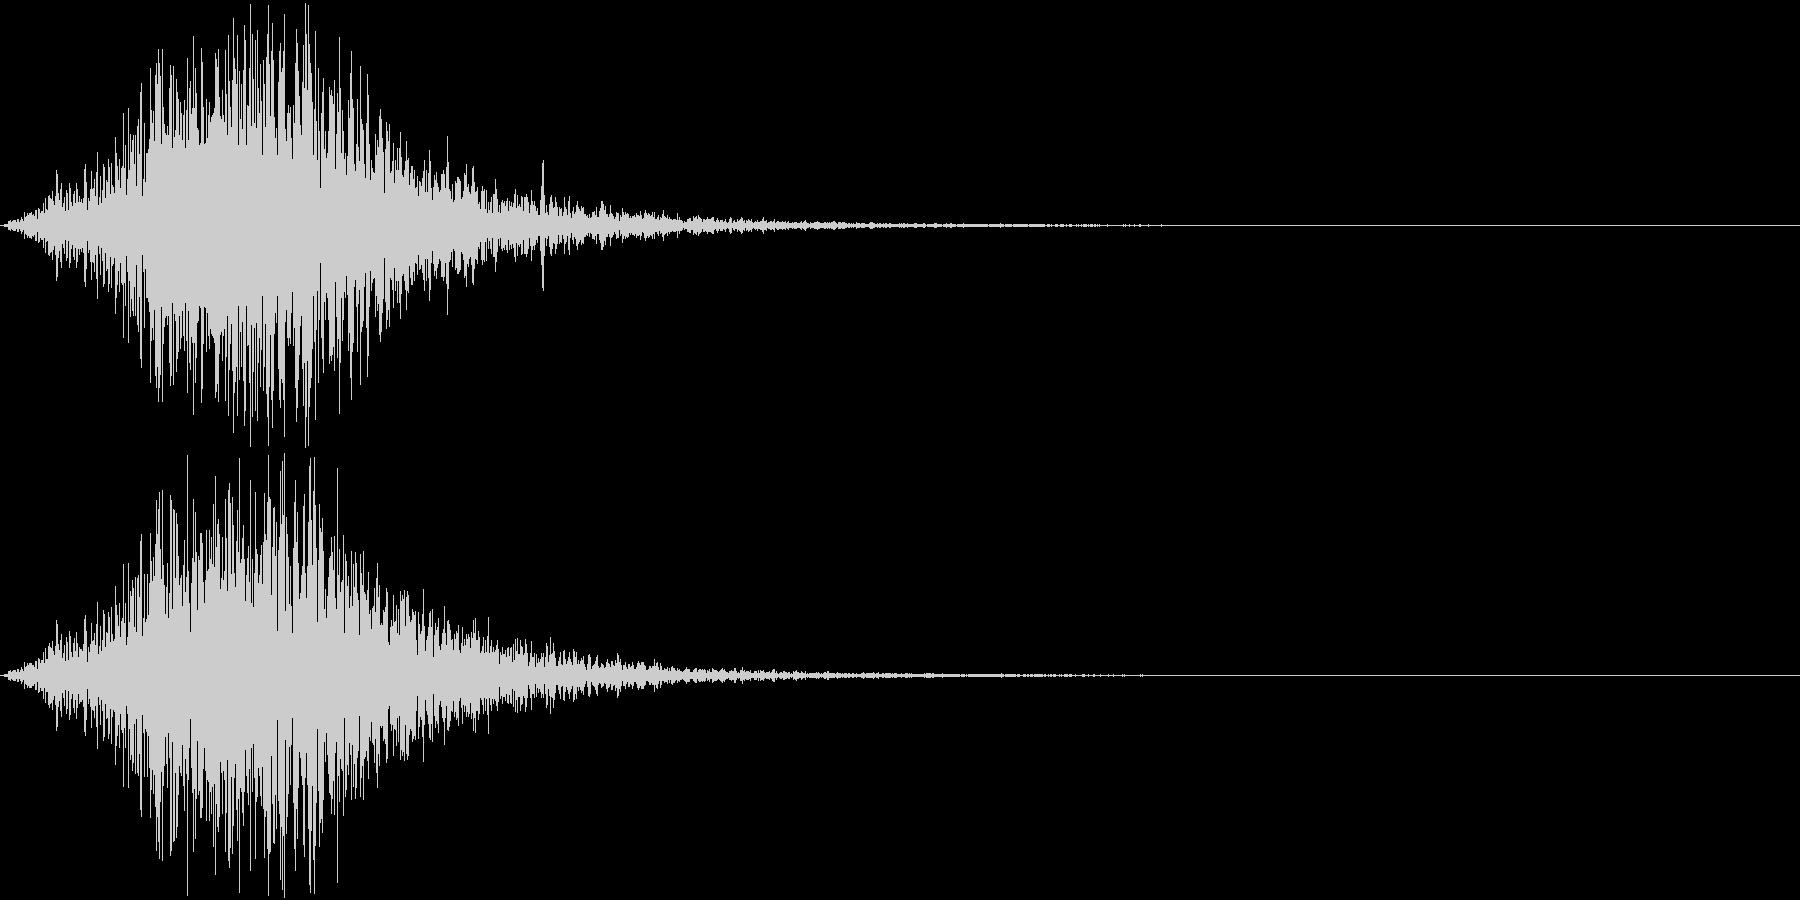 Battle 戦闘エフェクト音 9の未再生の波形